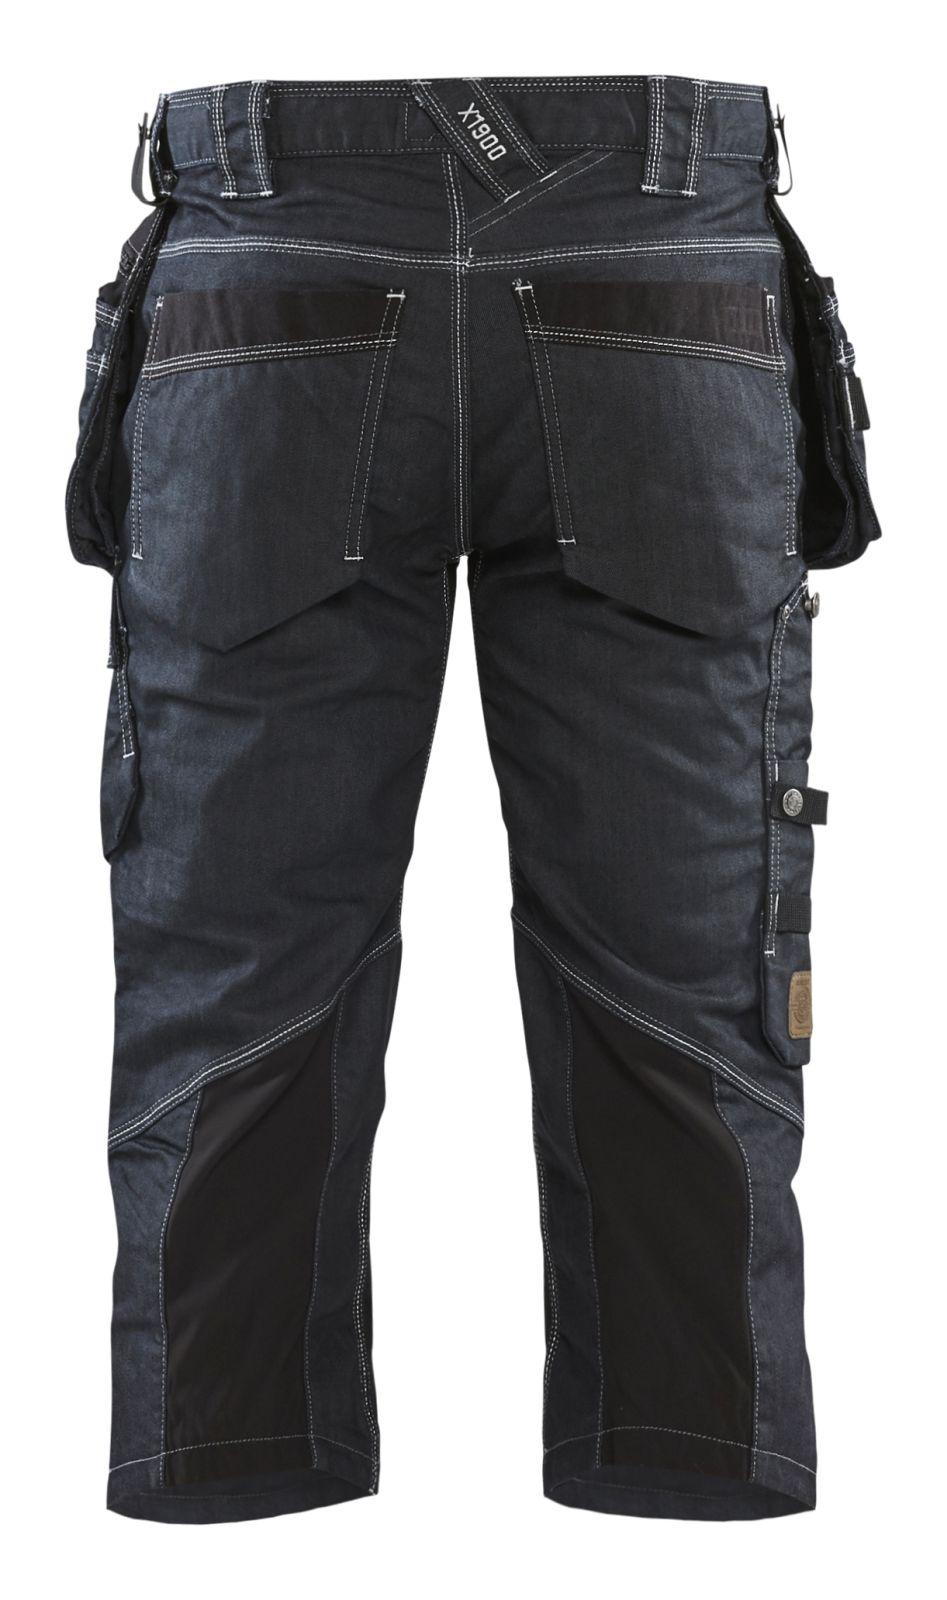 Blaklader Piraatbroeken 19911141 met Stretch marineblauw-zwart(8999)